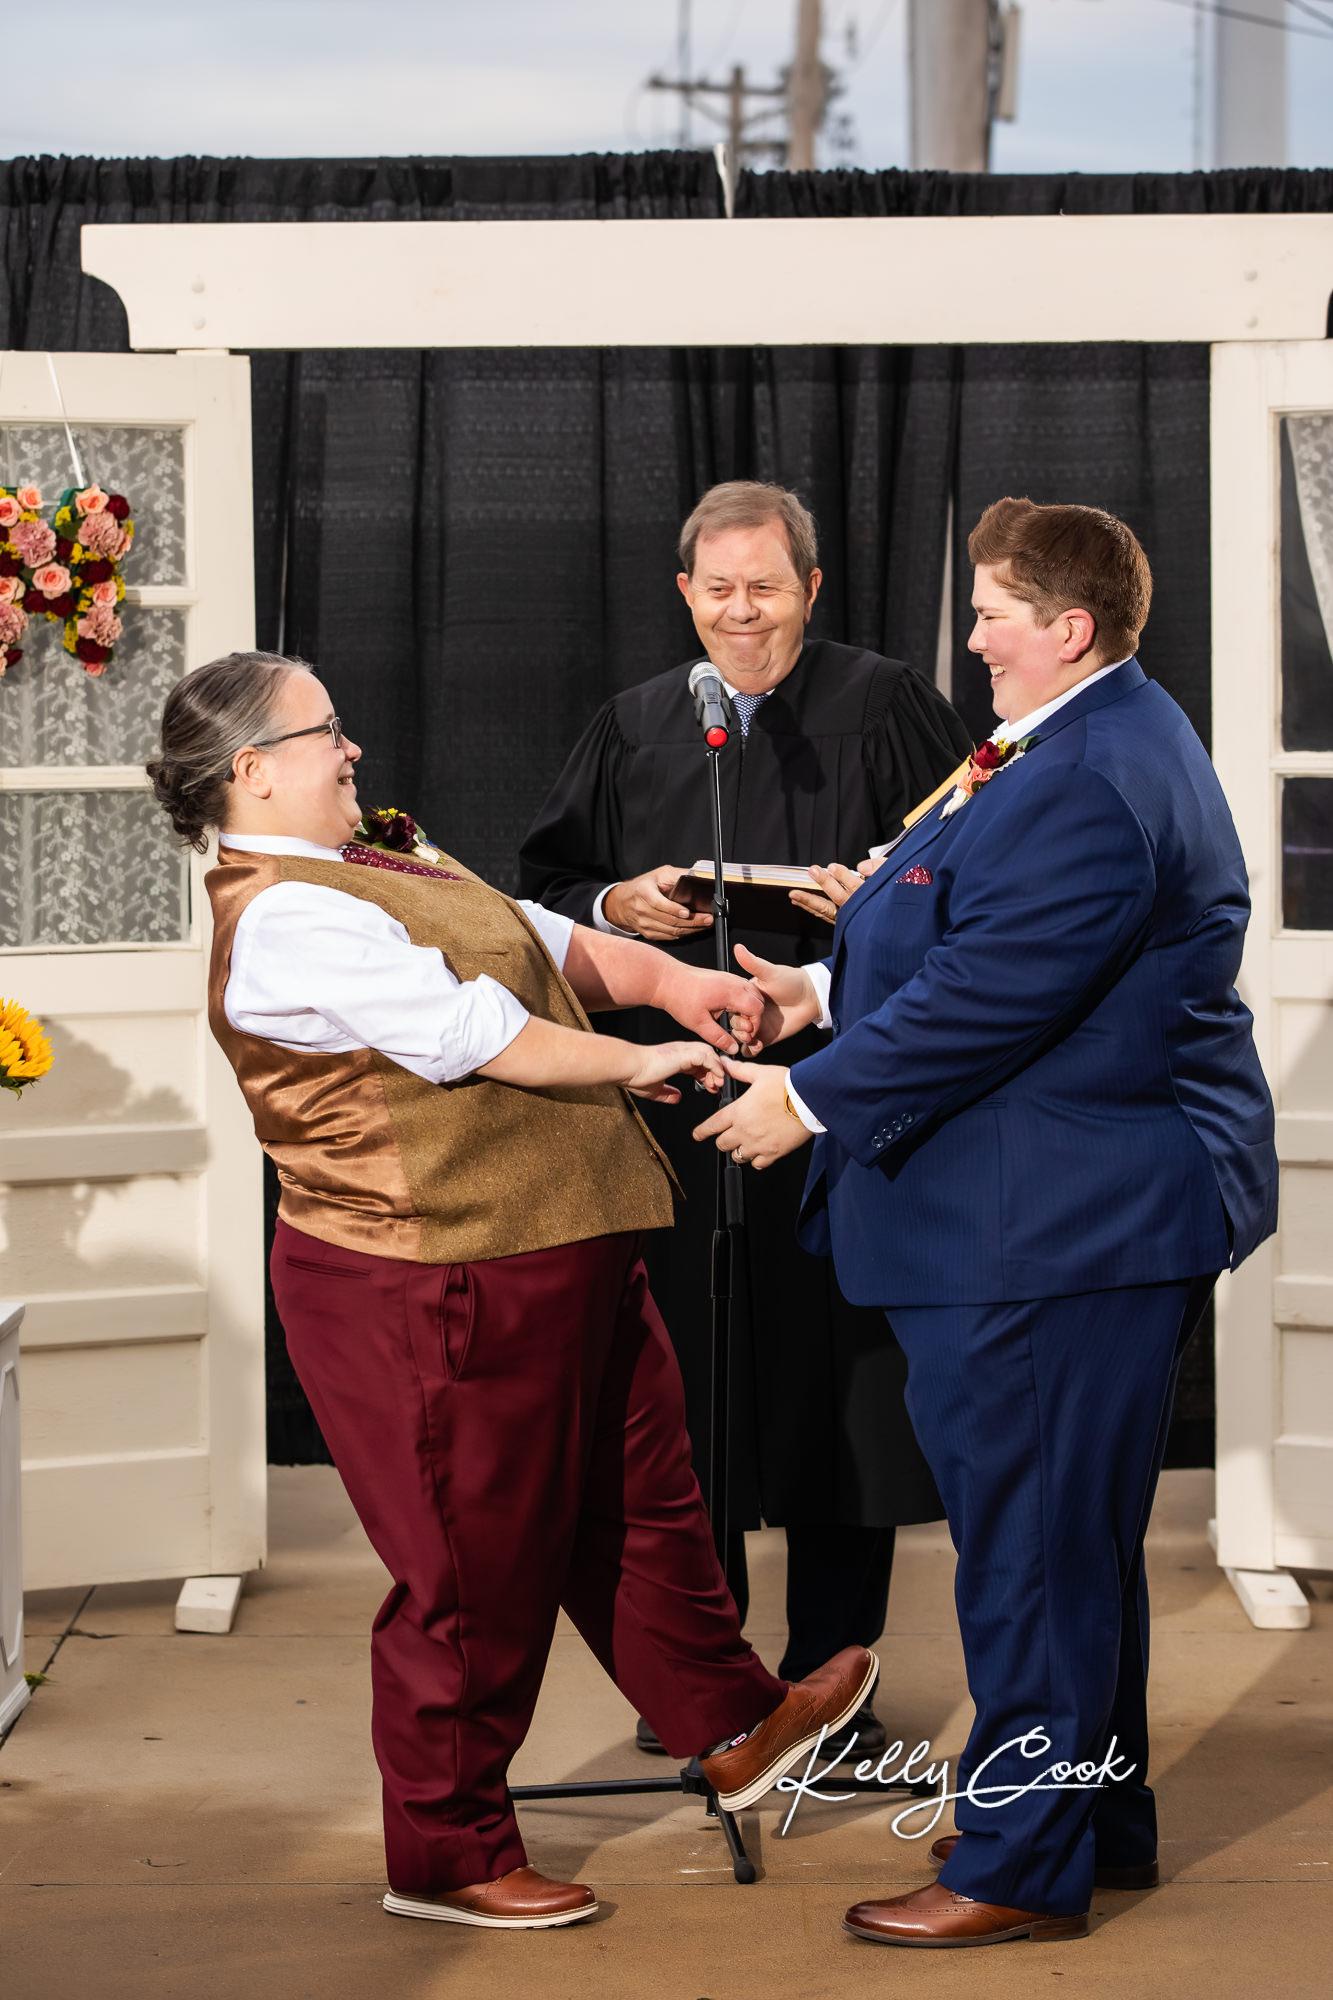 LGBTQ wedding ceremony